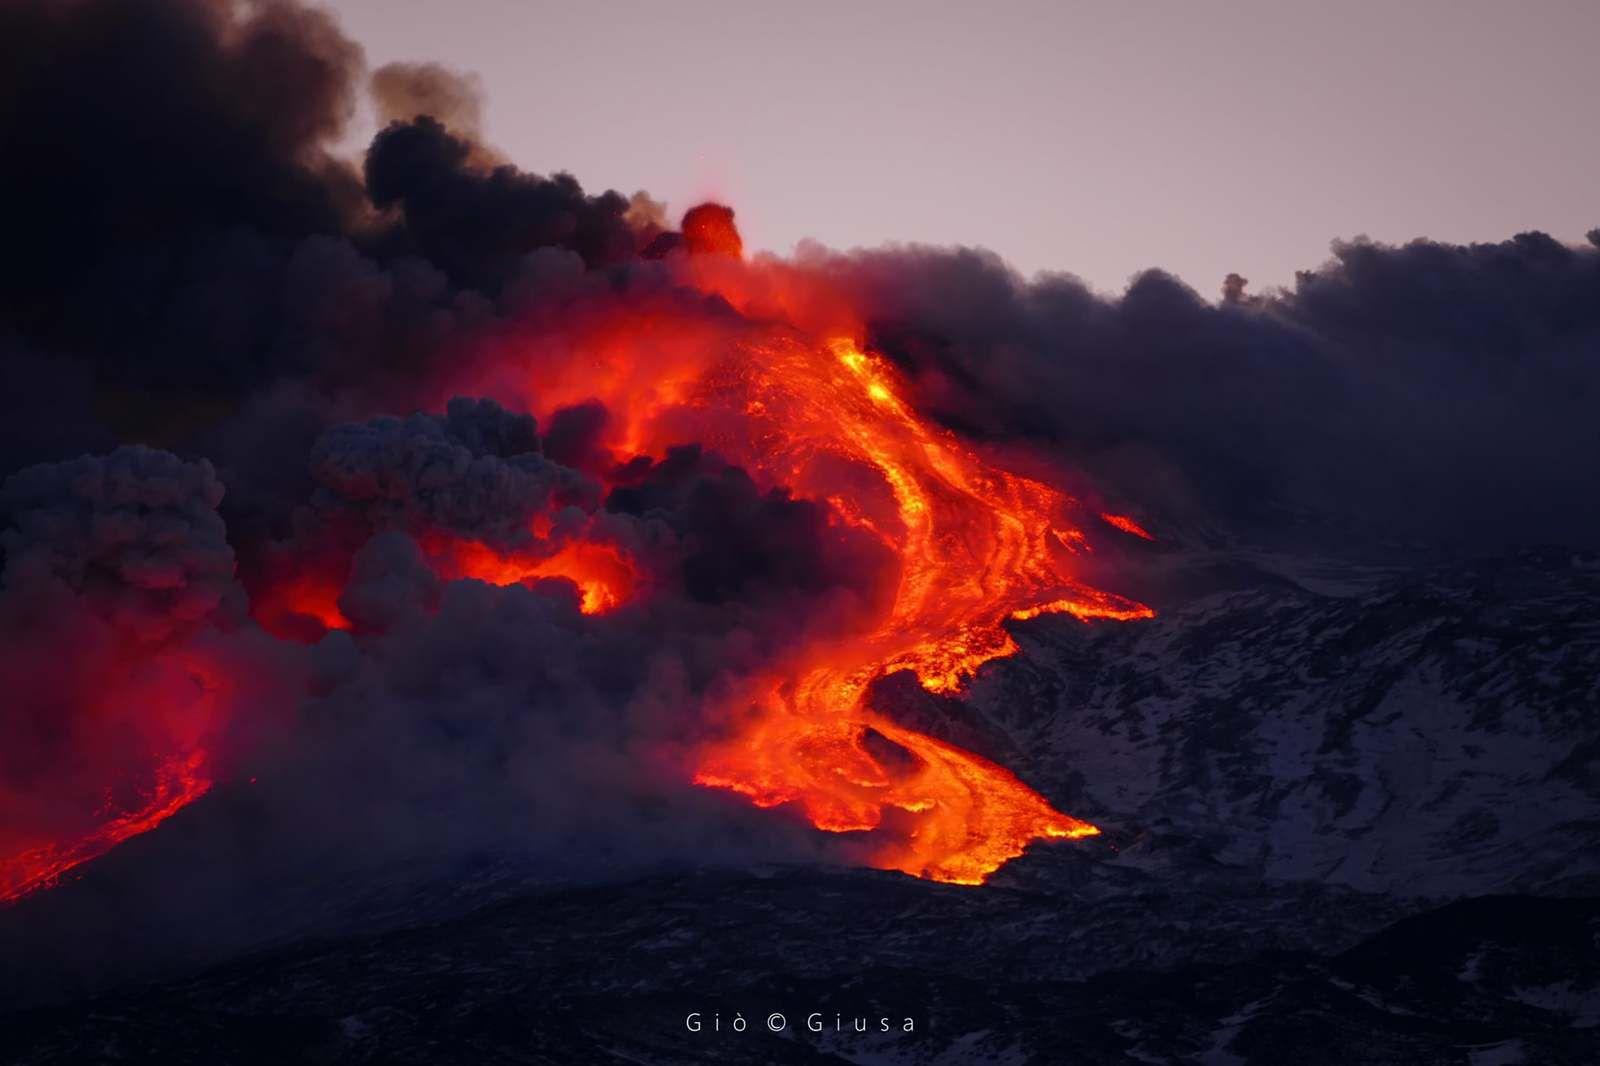 Etna - development of lava flows - photo 16.0202021 by Gio Giusa